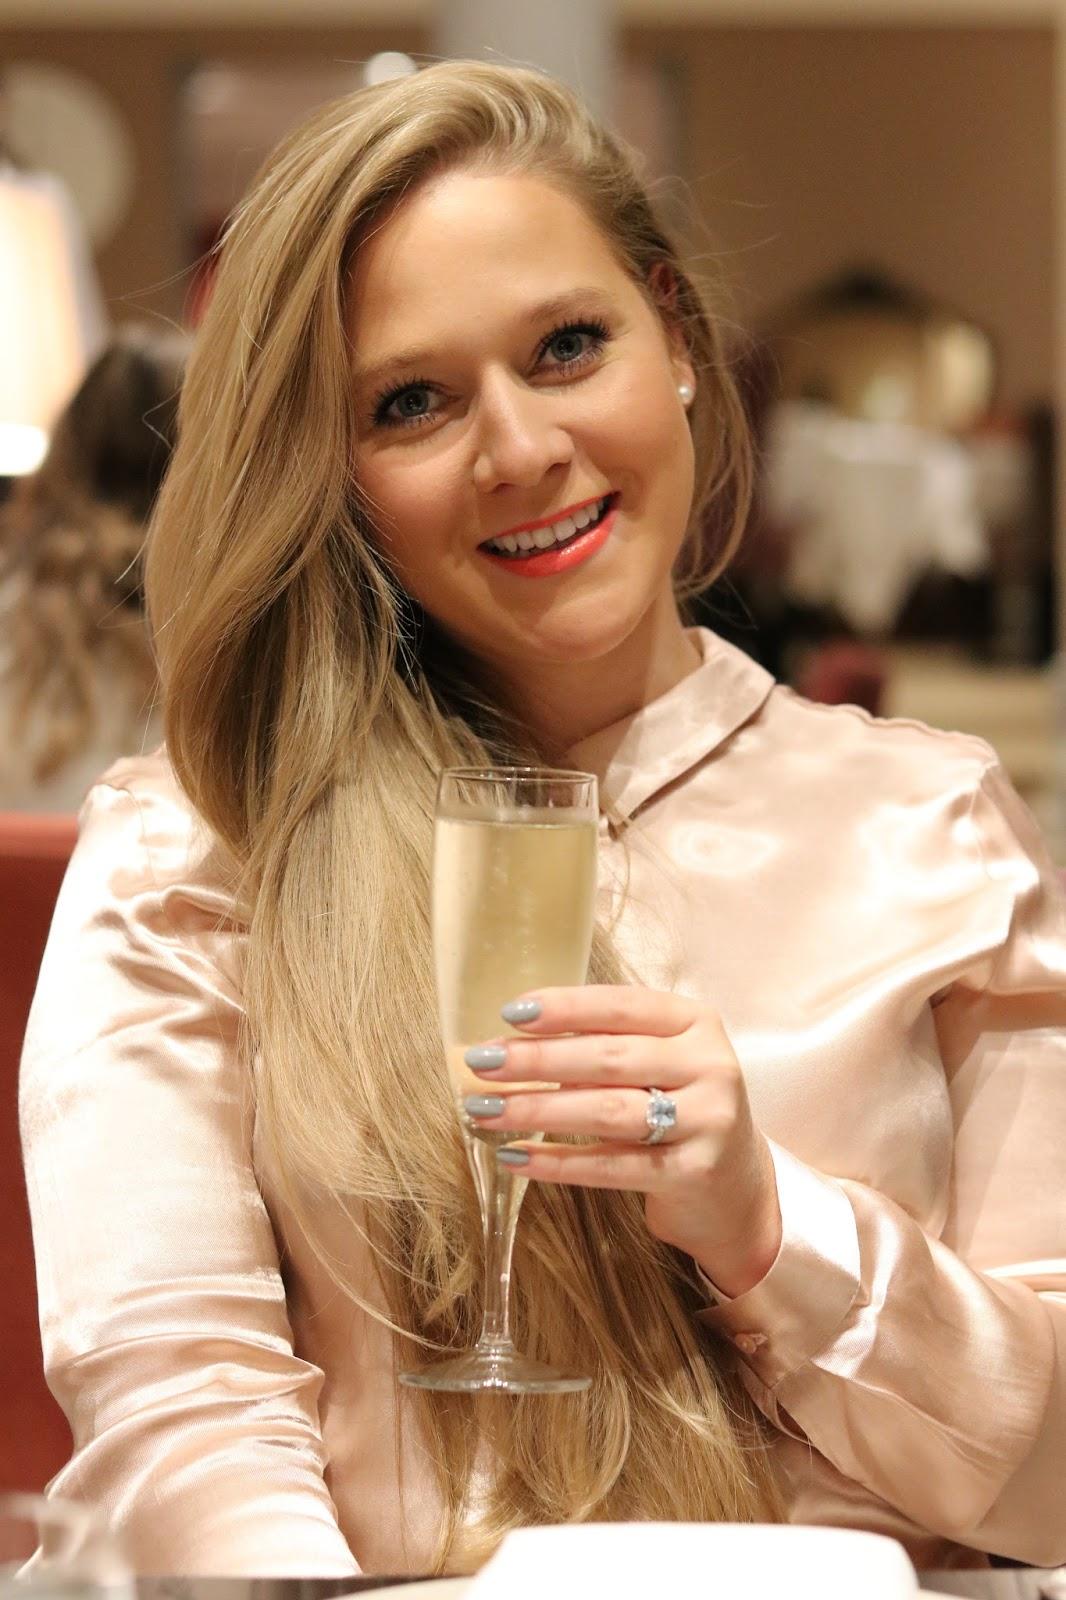 Katie Heath, KALANCHOE at Champneys Tring